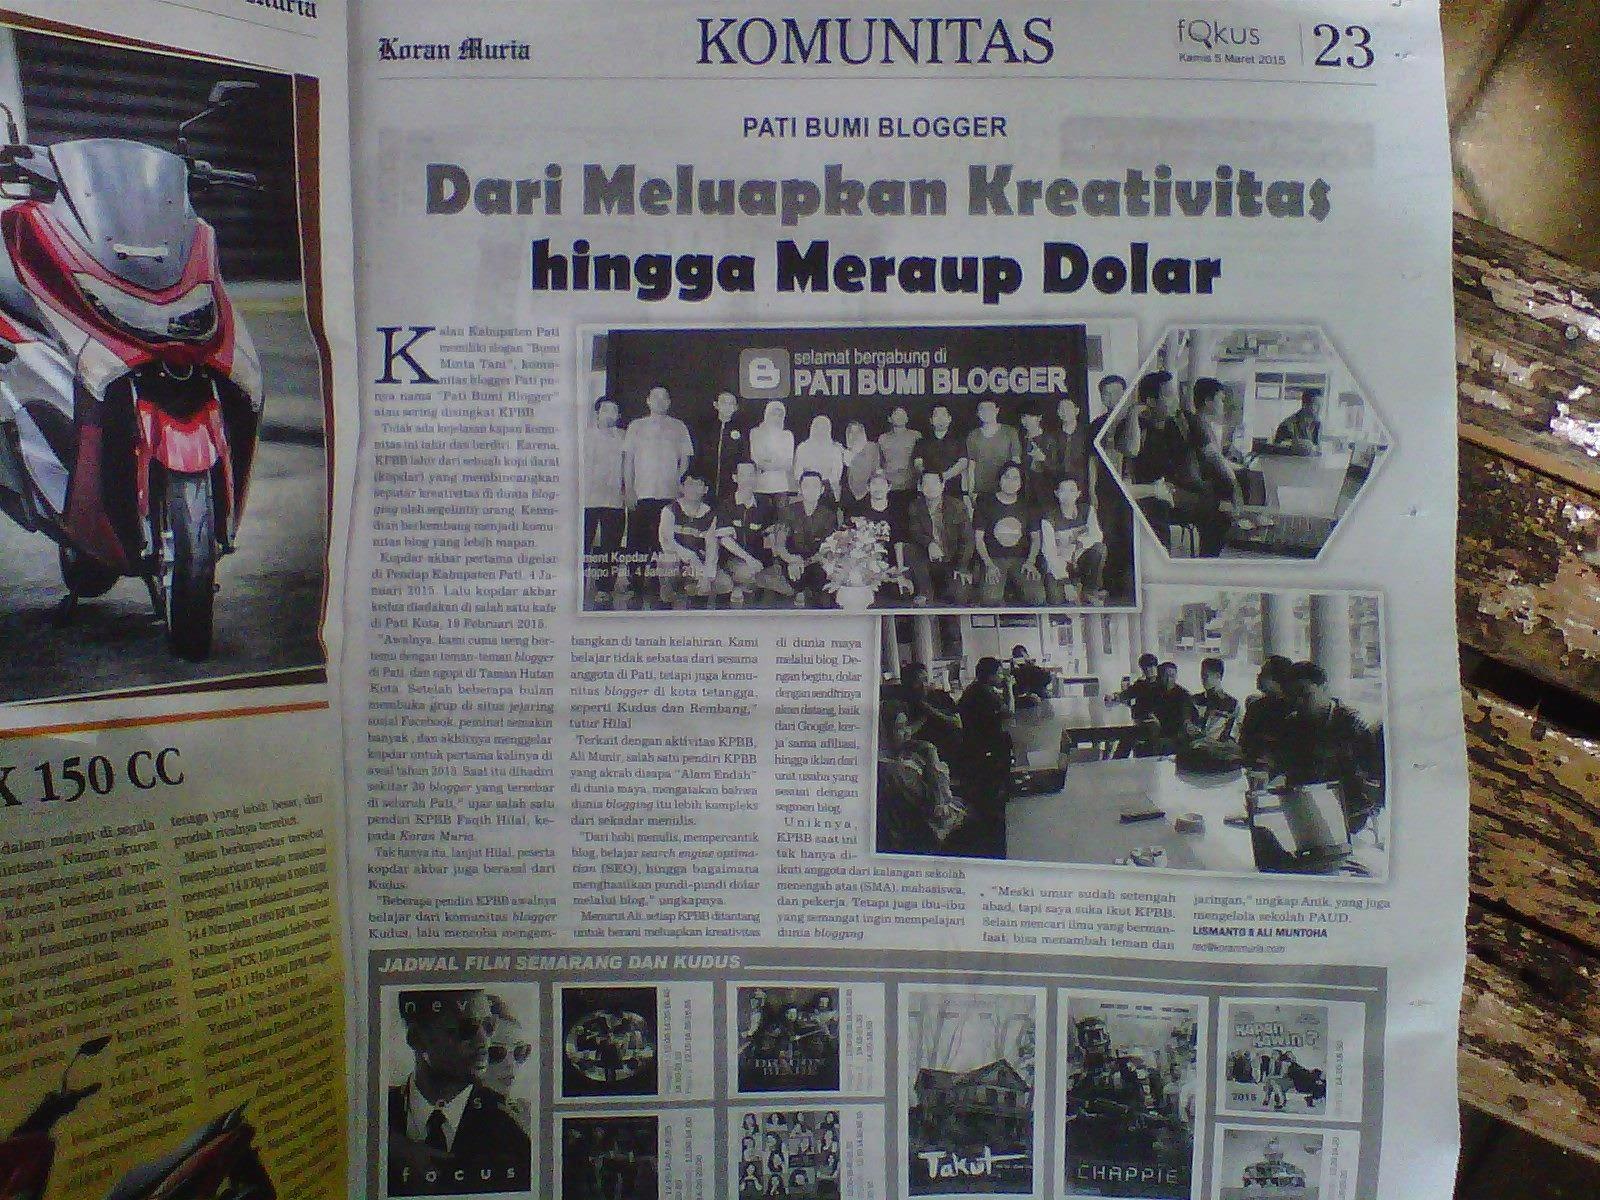 komunitas pati bumi blogger masuk koran lokal